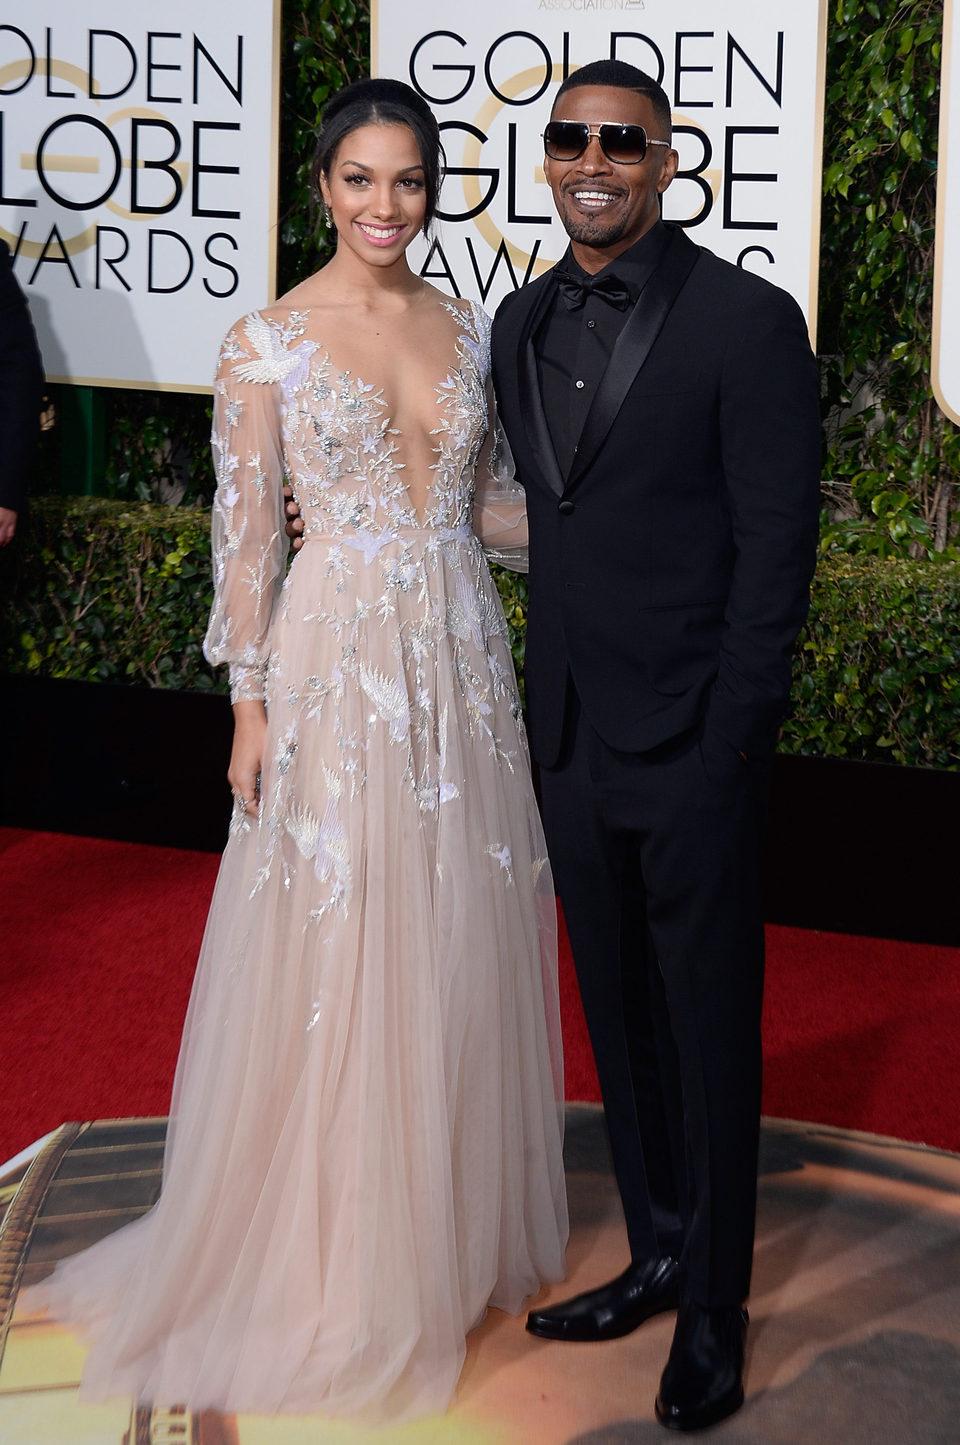 Jamie Foxx and Corinne Foxx at the 2016 Golden Globes red carpet